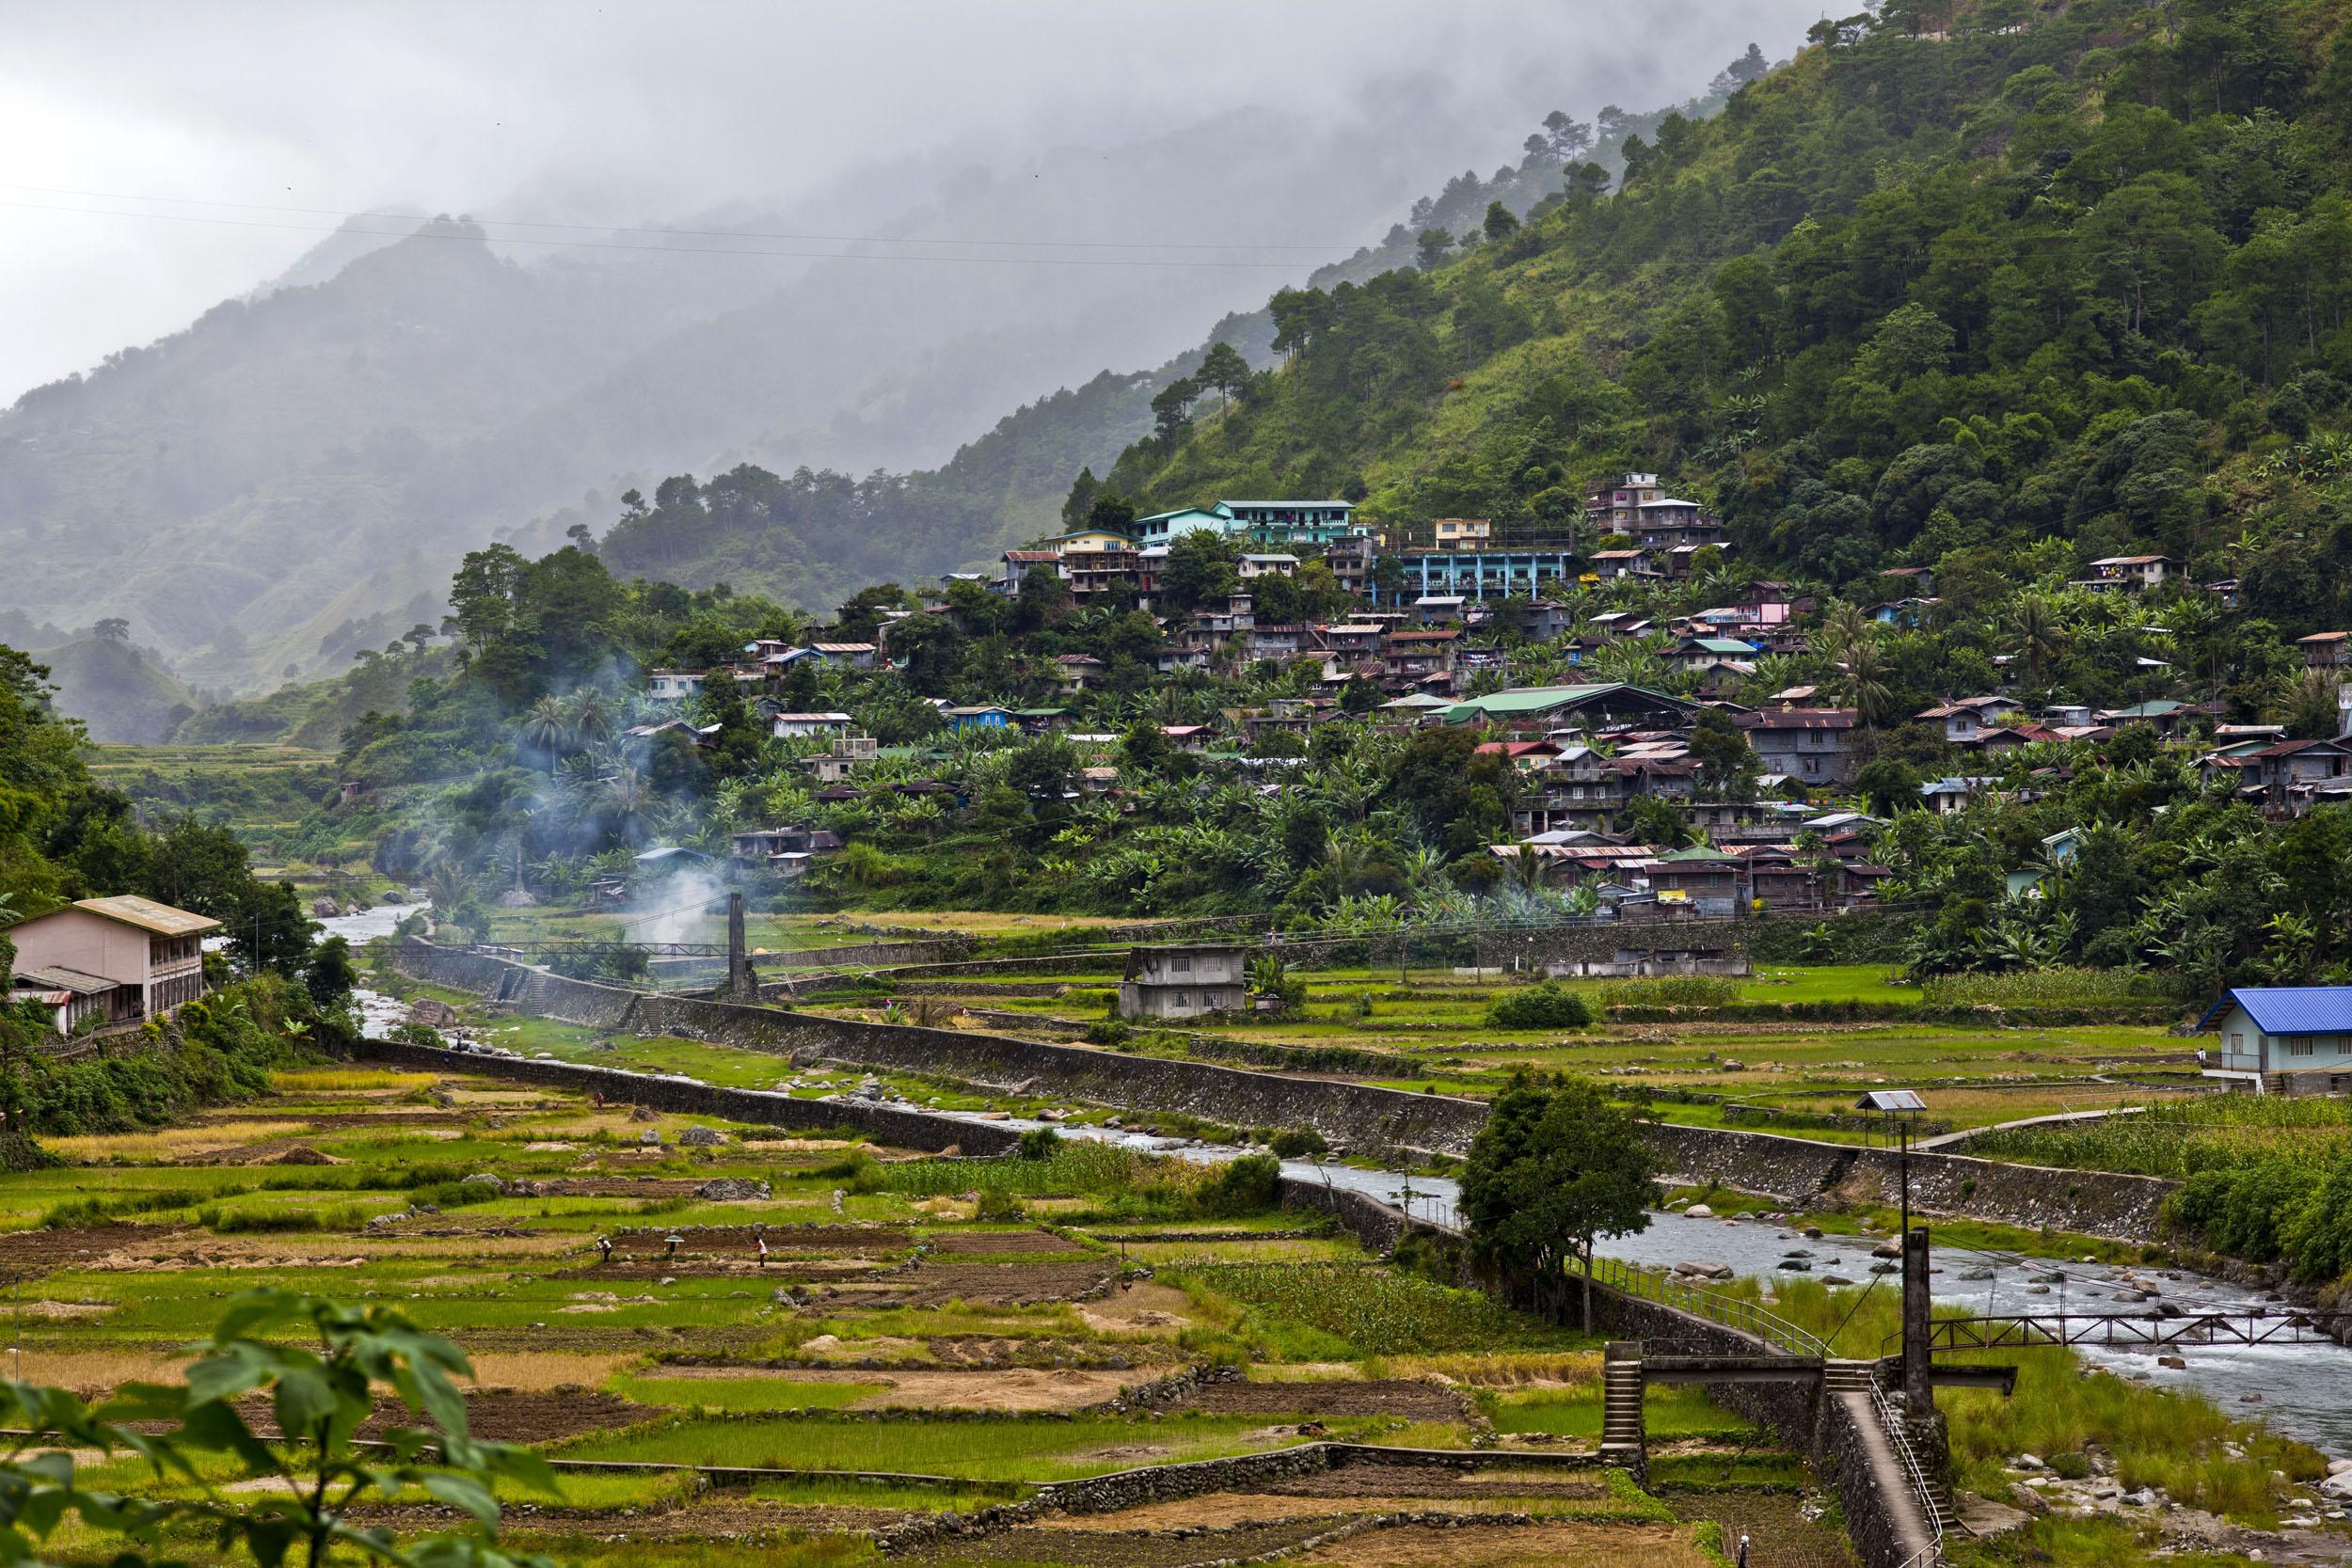 Local towns and villages along the Kabayan Rd Halsema Highway from Baguio to Sagada Aug 2011 11